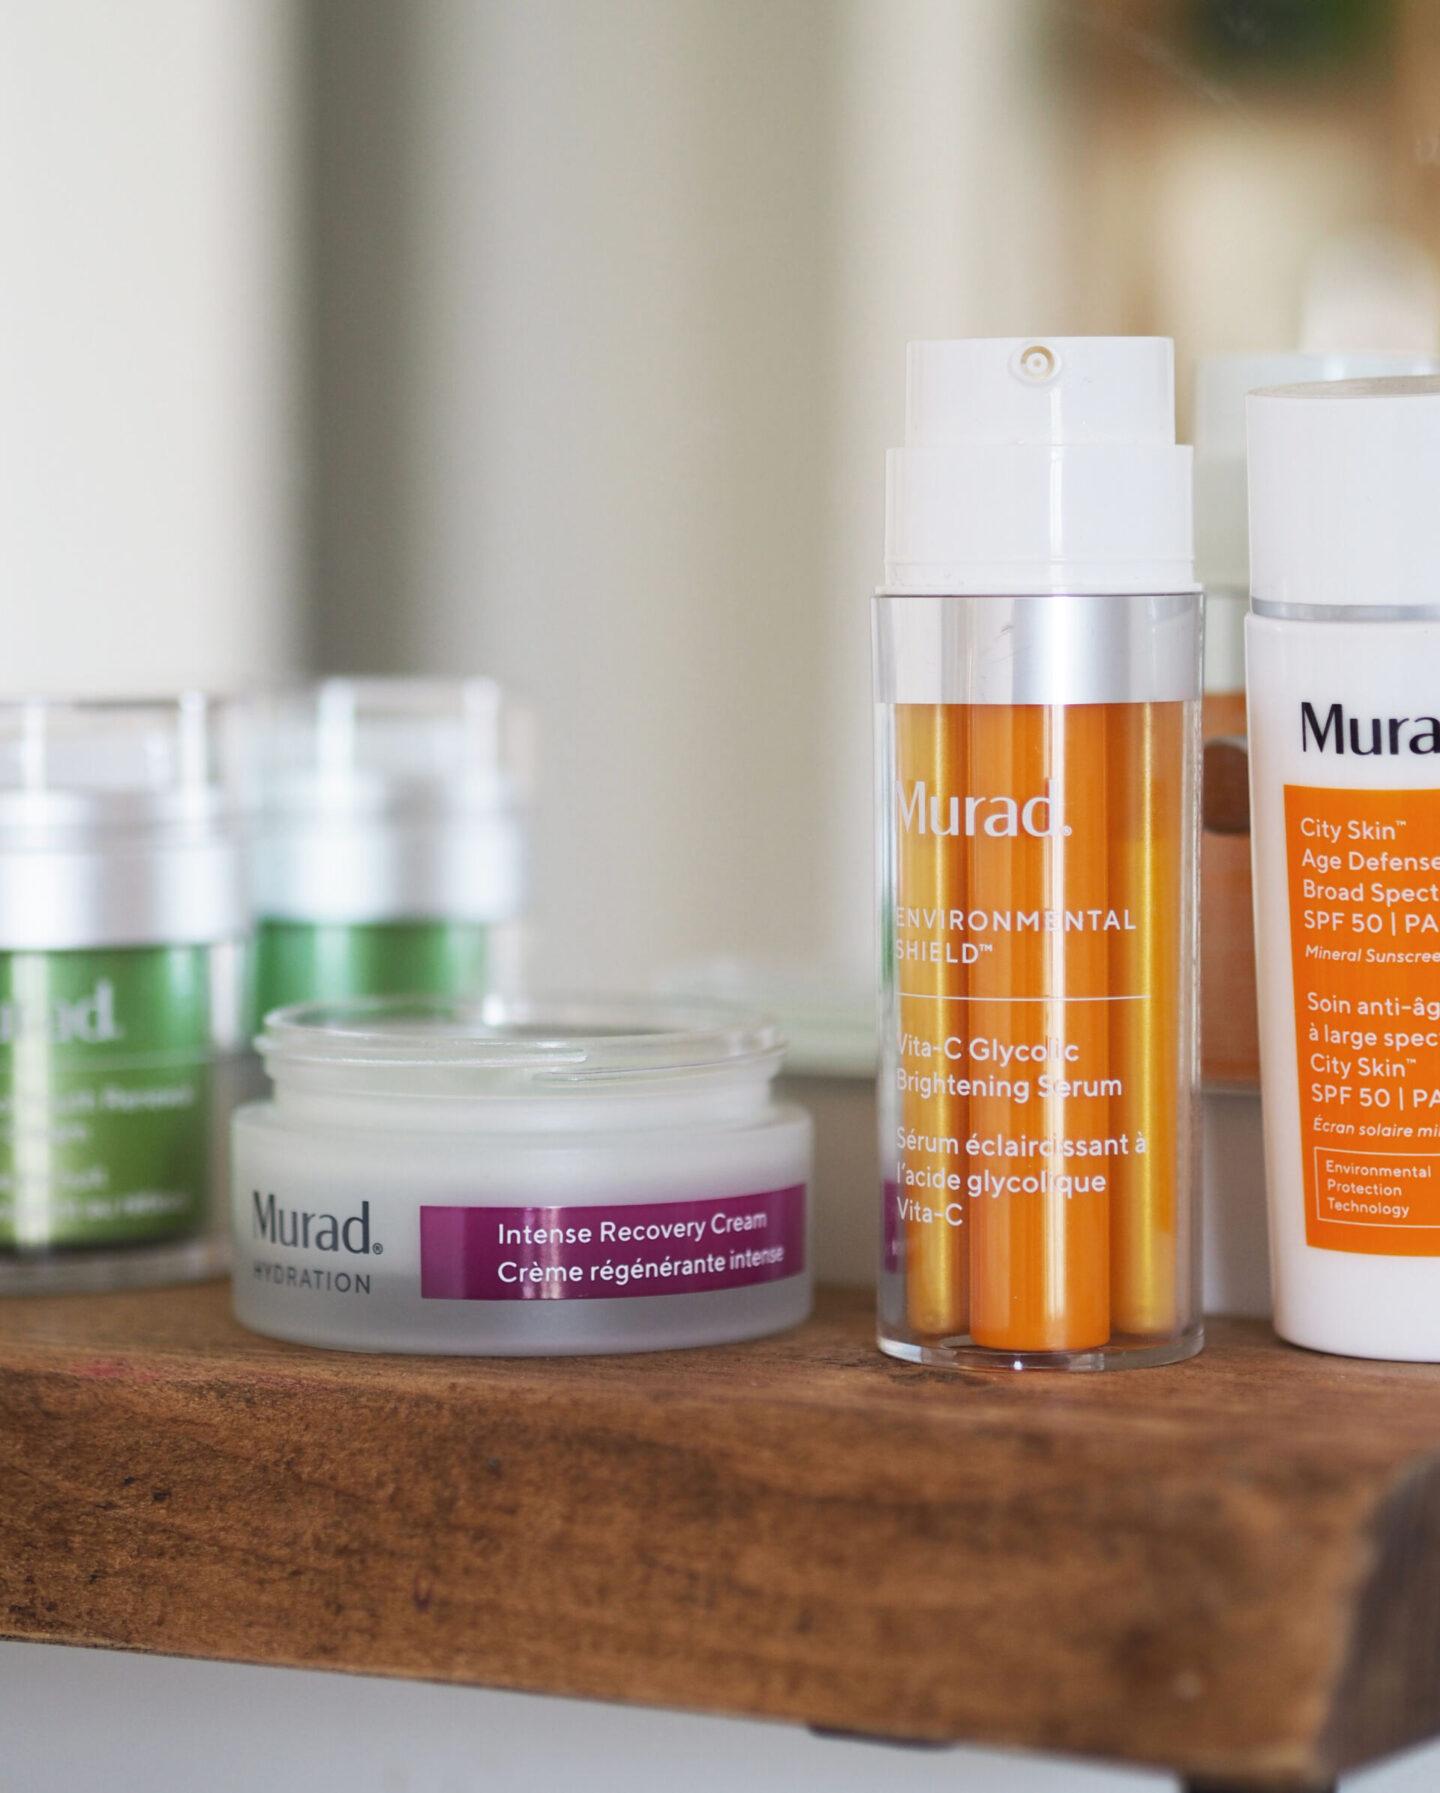 Murad intense recovery cream review